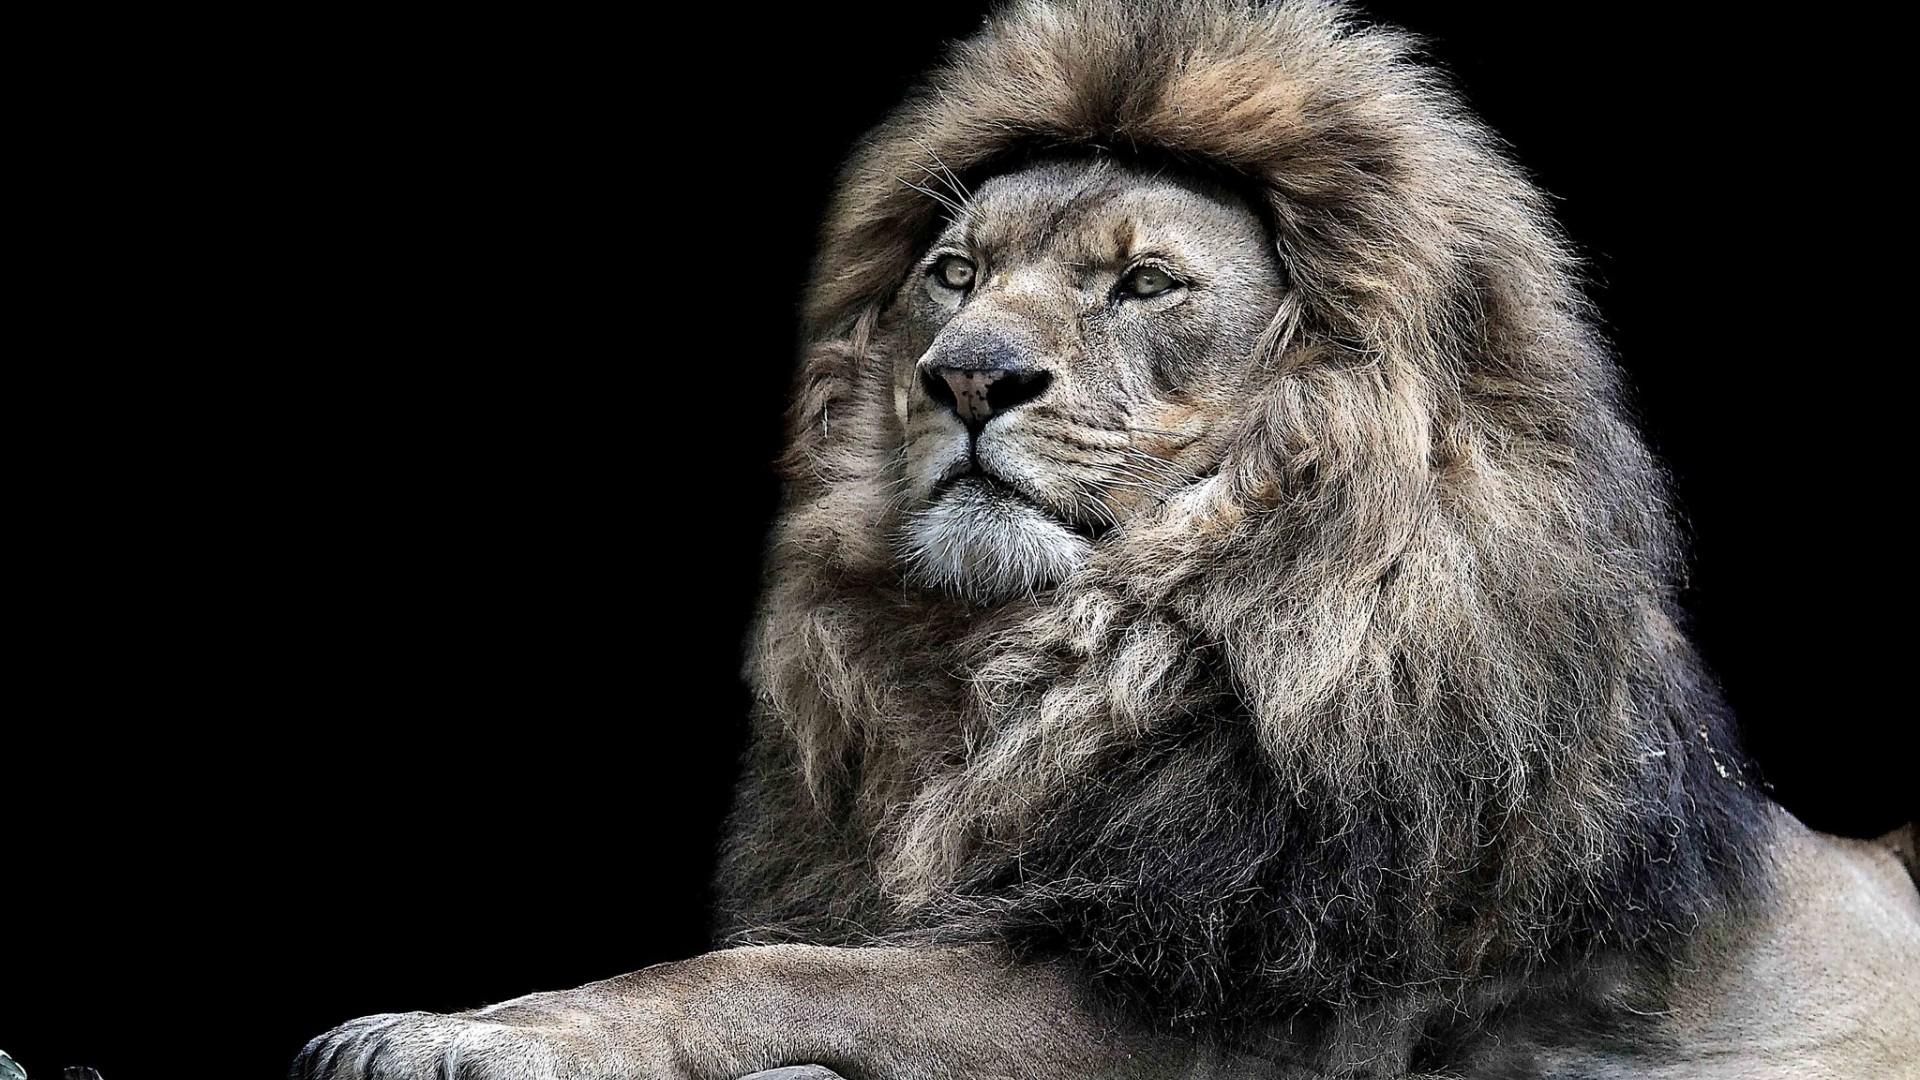 Monochrome lion hd animals 4k wallpapers images - Lion 4k wallpaper for mobile ...